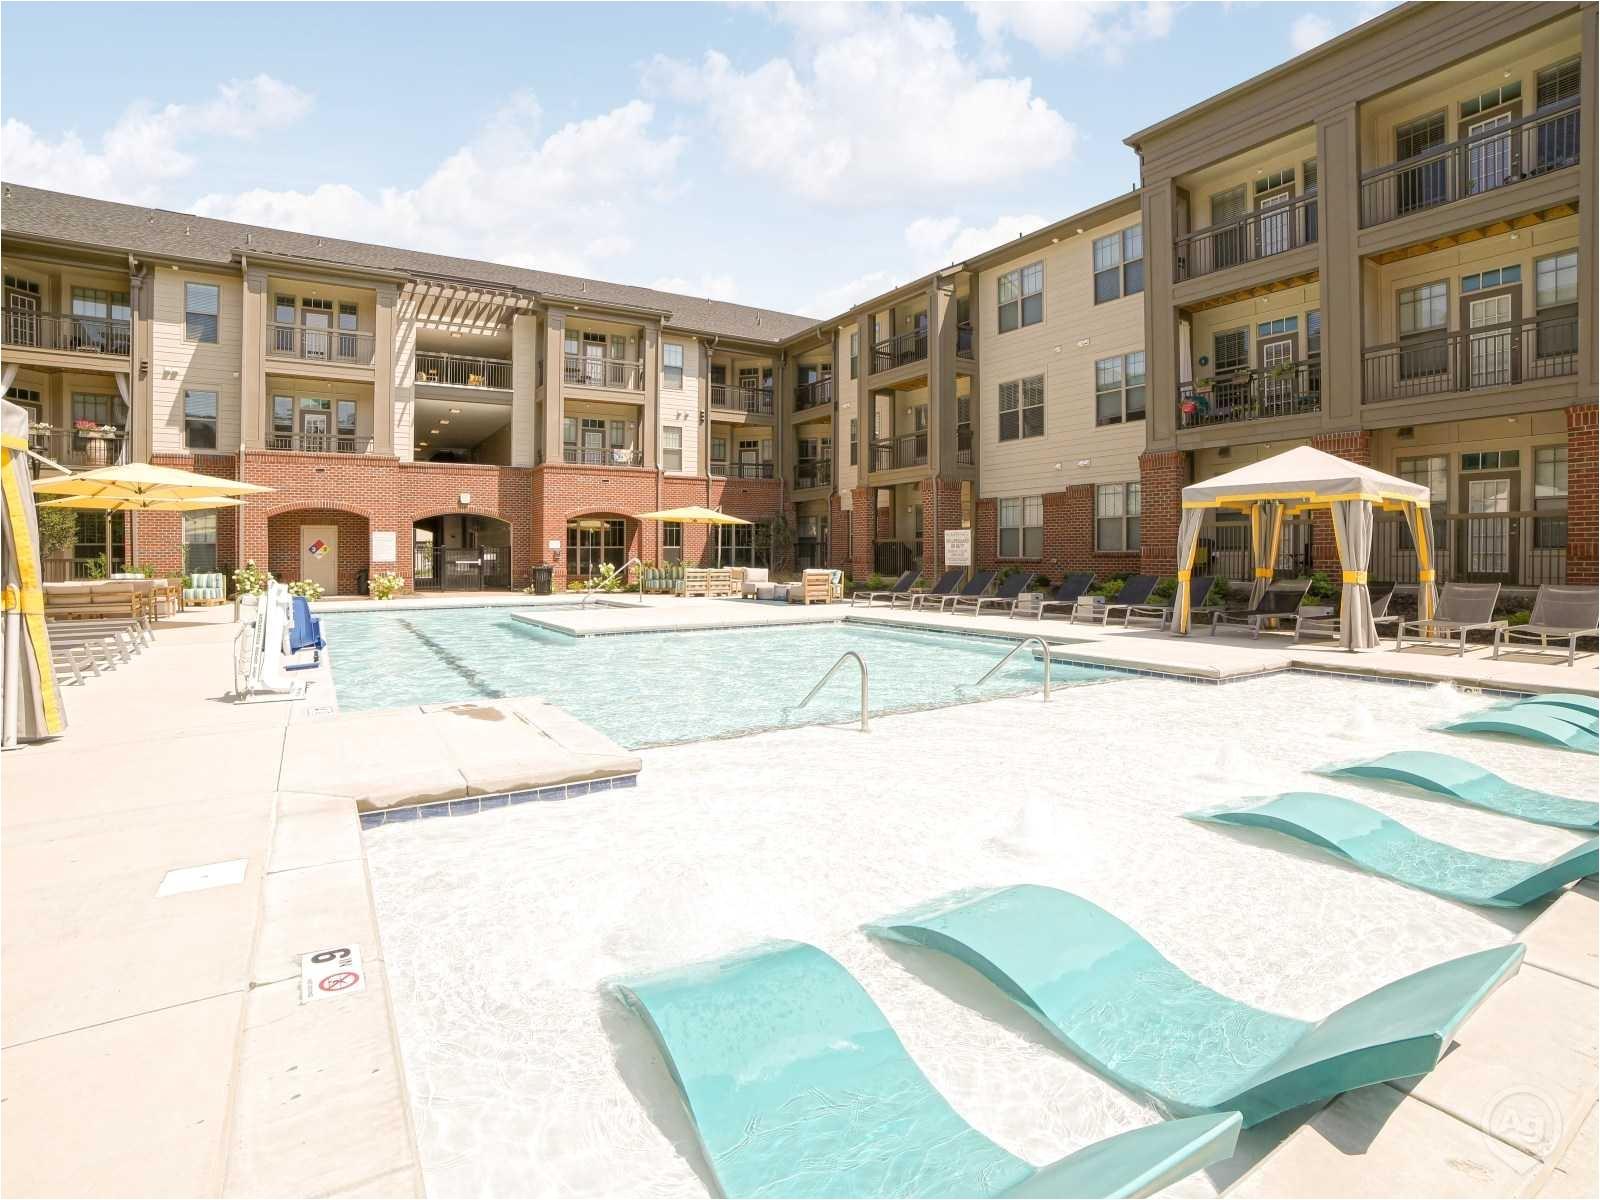 2 Bedroom Apartments Under 800 In Charlotte Nc Fountains Matthews Apartments Matthews Nc 28105